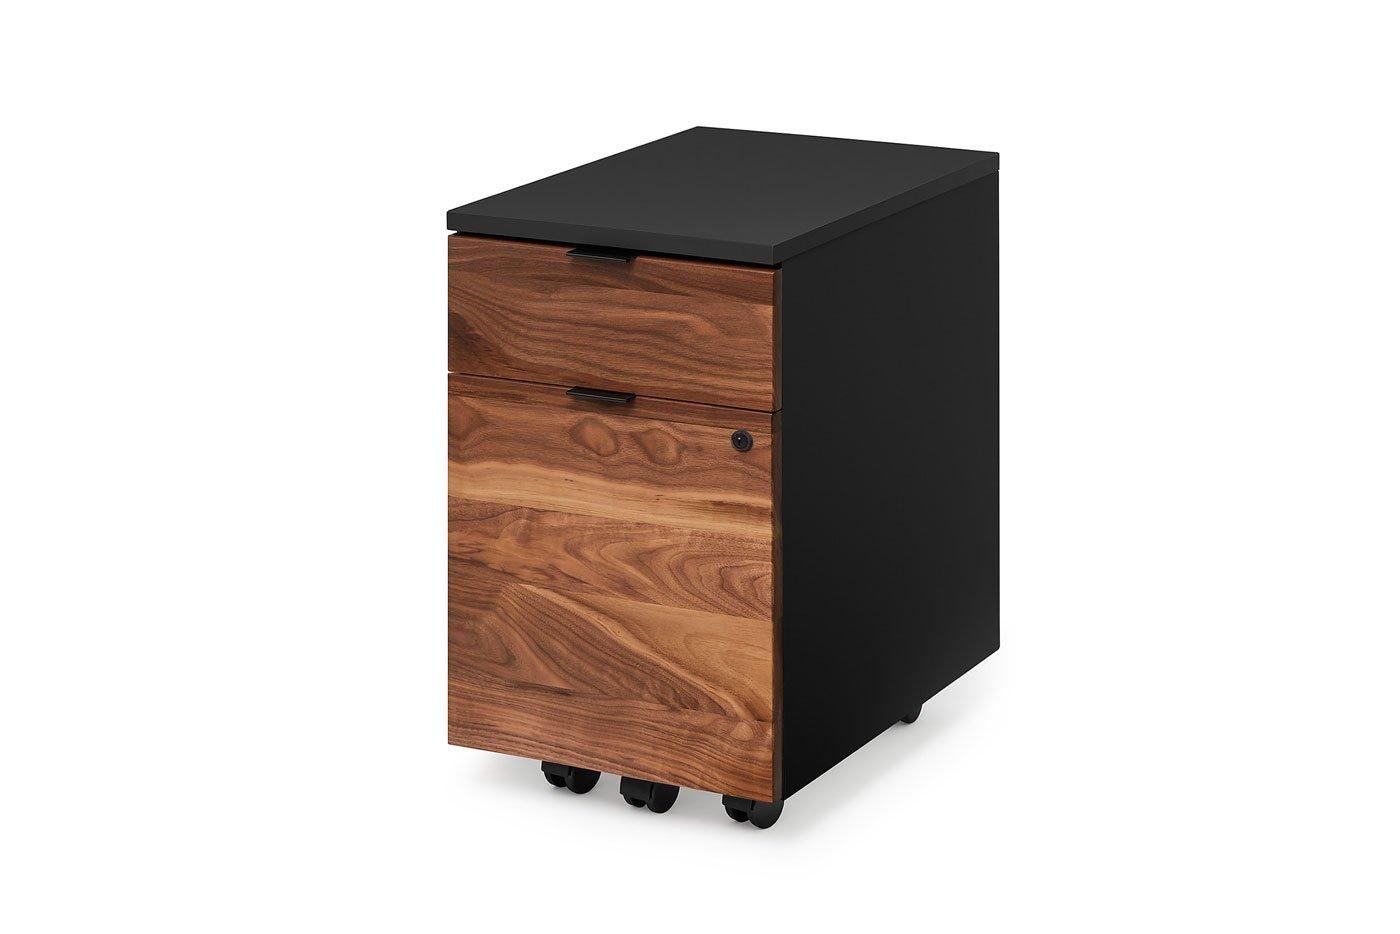 Ergonofis Neat Walnut Filing Cabinet